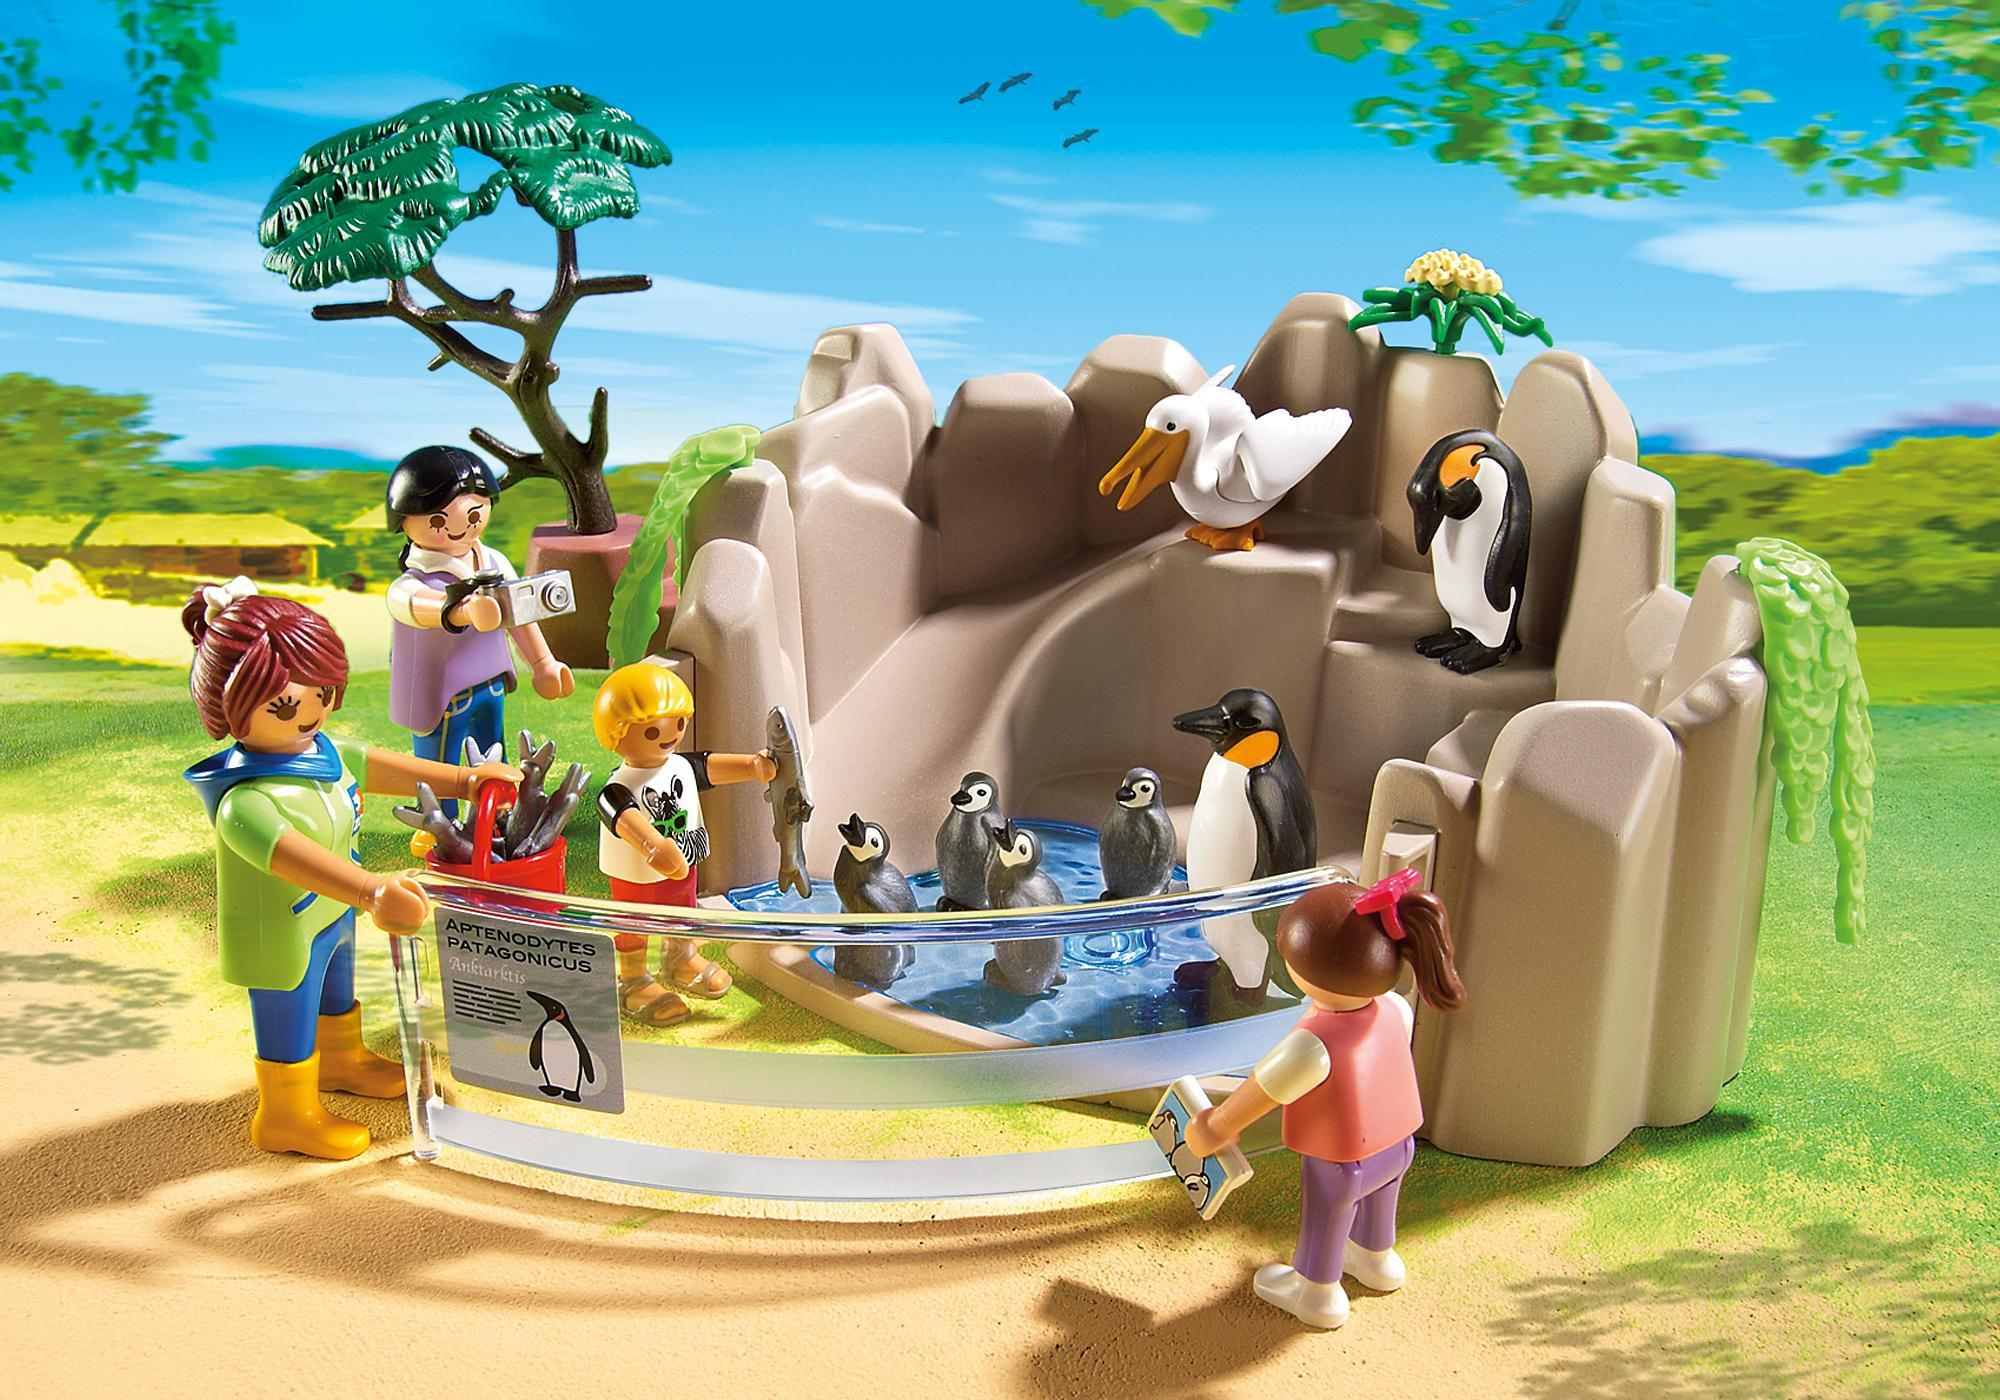 http://media.playmobil.com/i/playmobil/6634_product_extra3/Large City Zoo